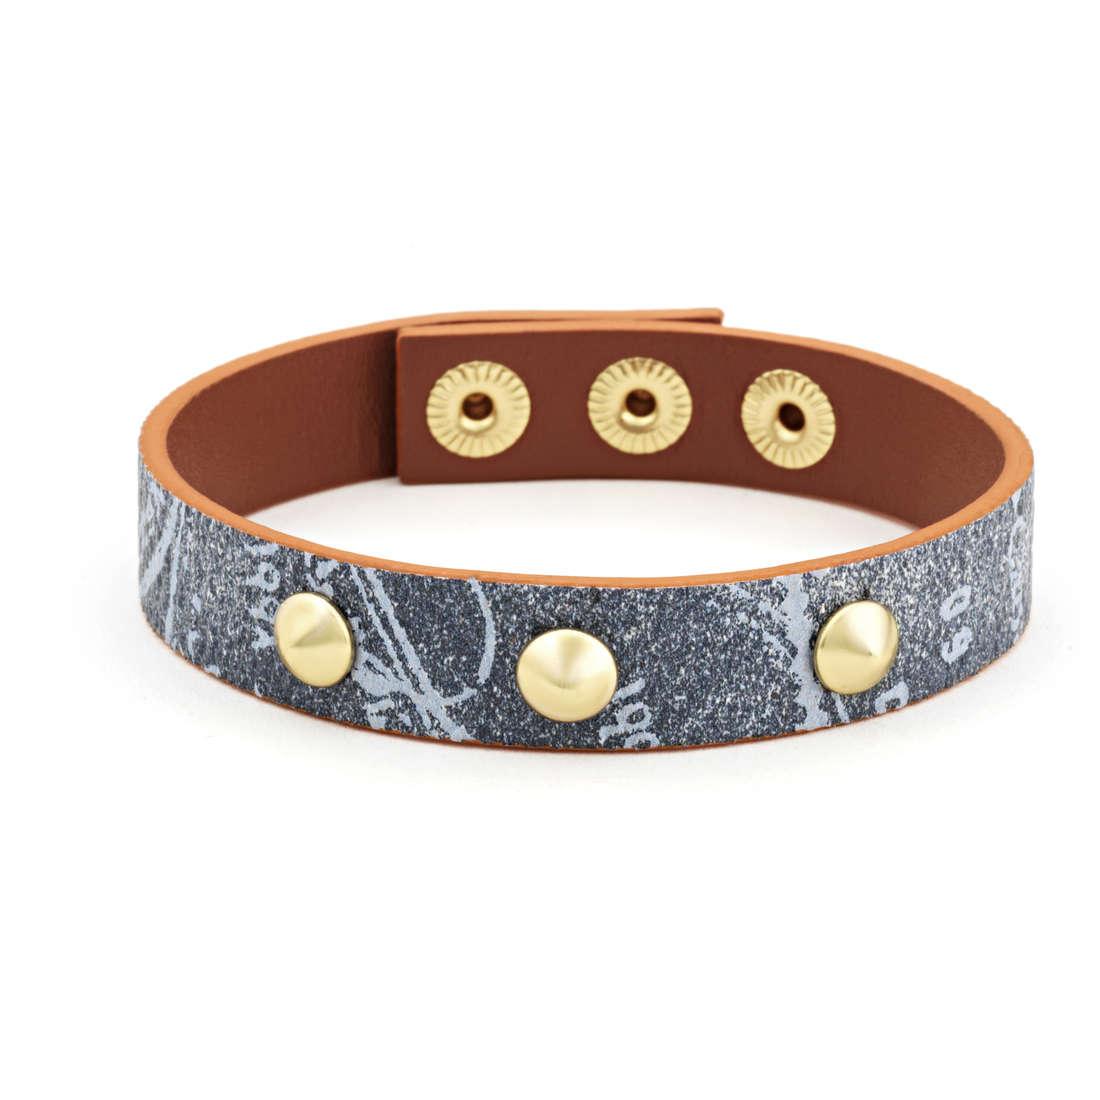 Borse Alviero Martini Alv : Bracelet woman jewellery alv alviero martini